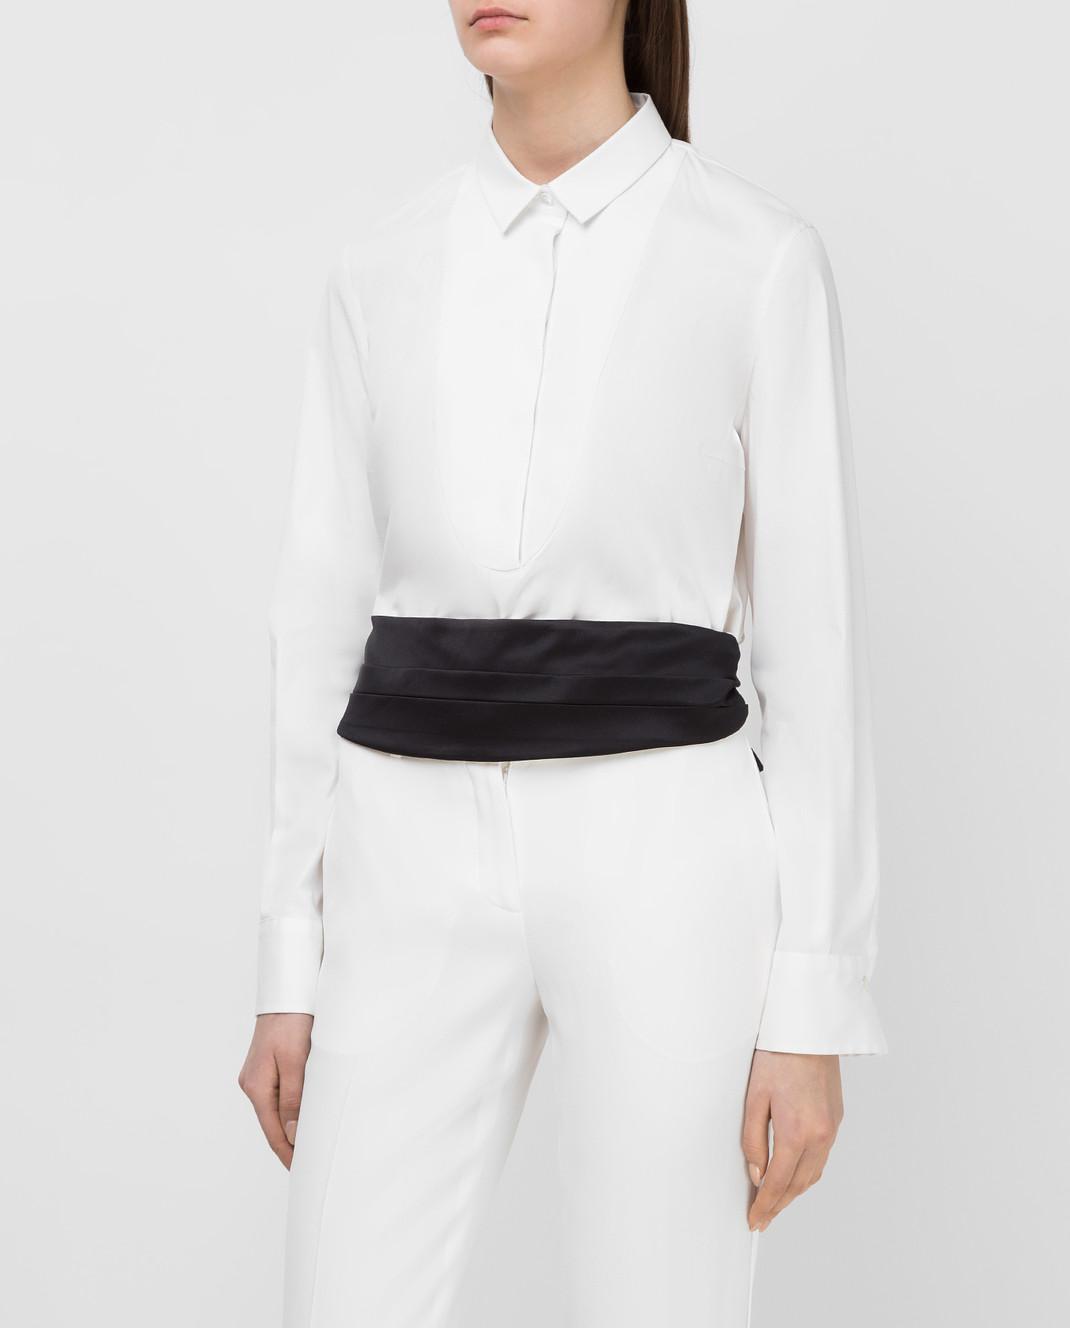 Brunello Cucinelli Белая рубашка M0091M6215 изображение 3